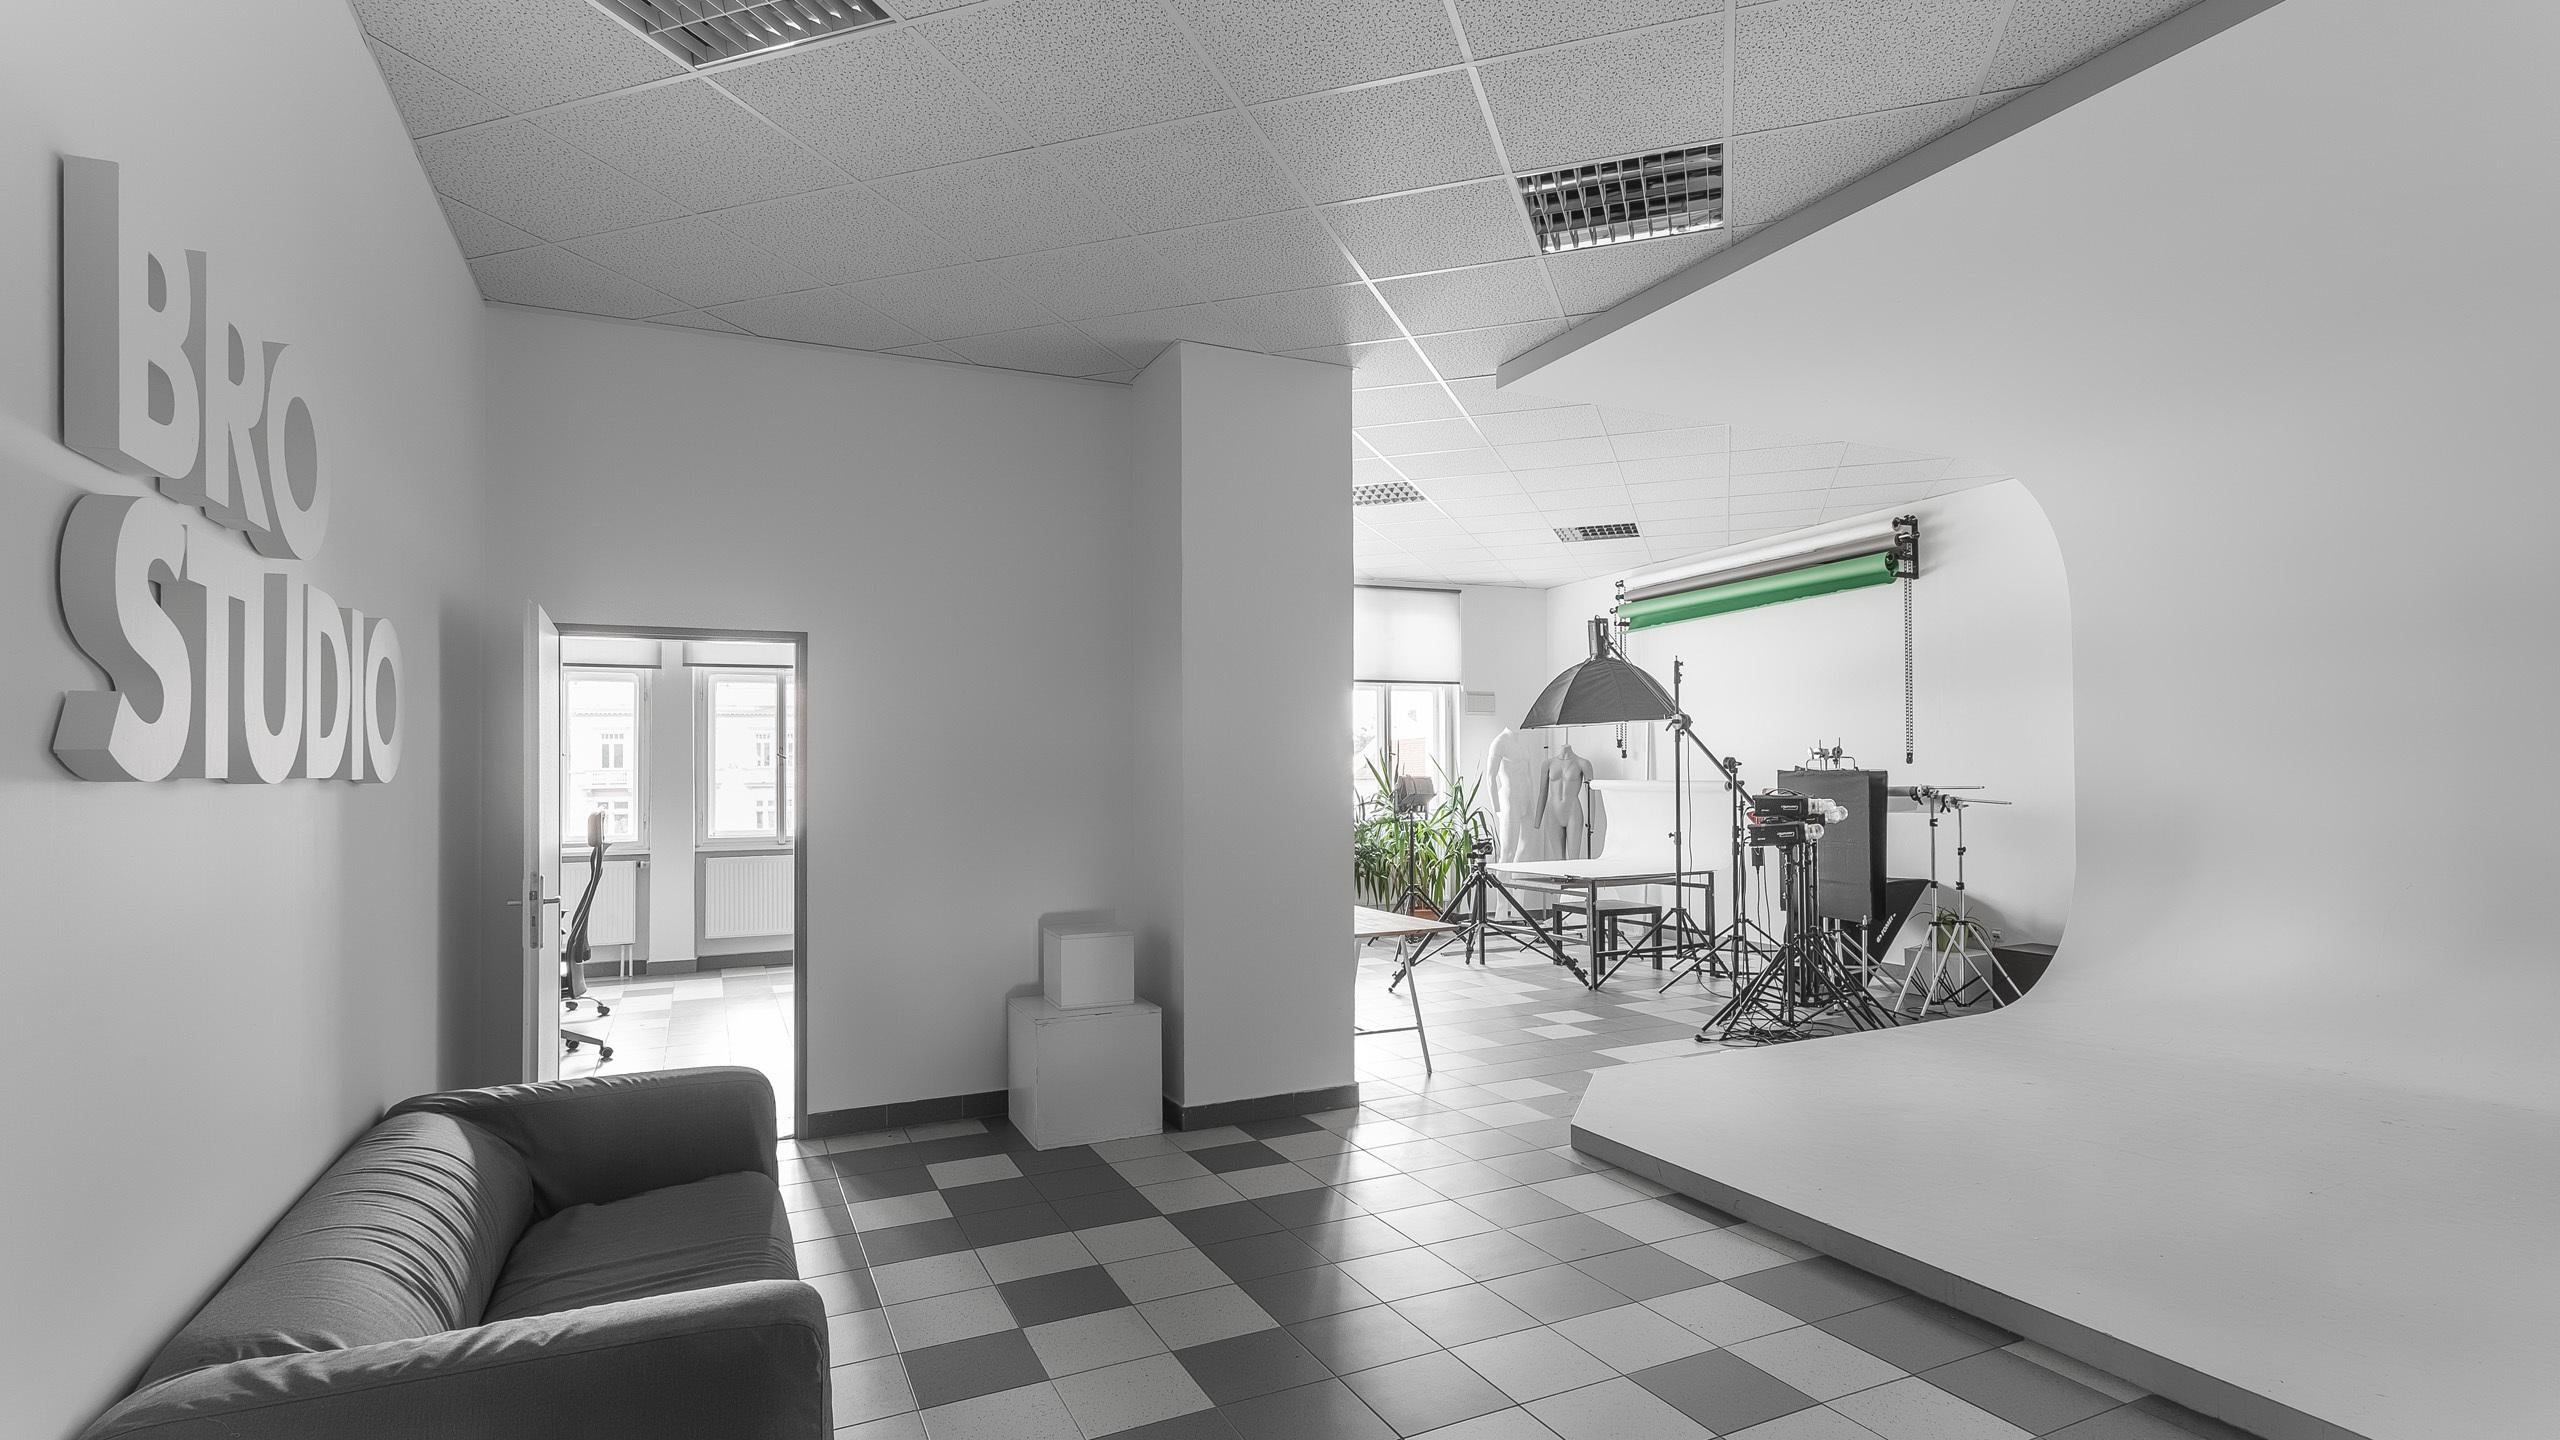 Brostudio - product photography studio closer